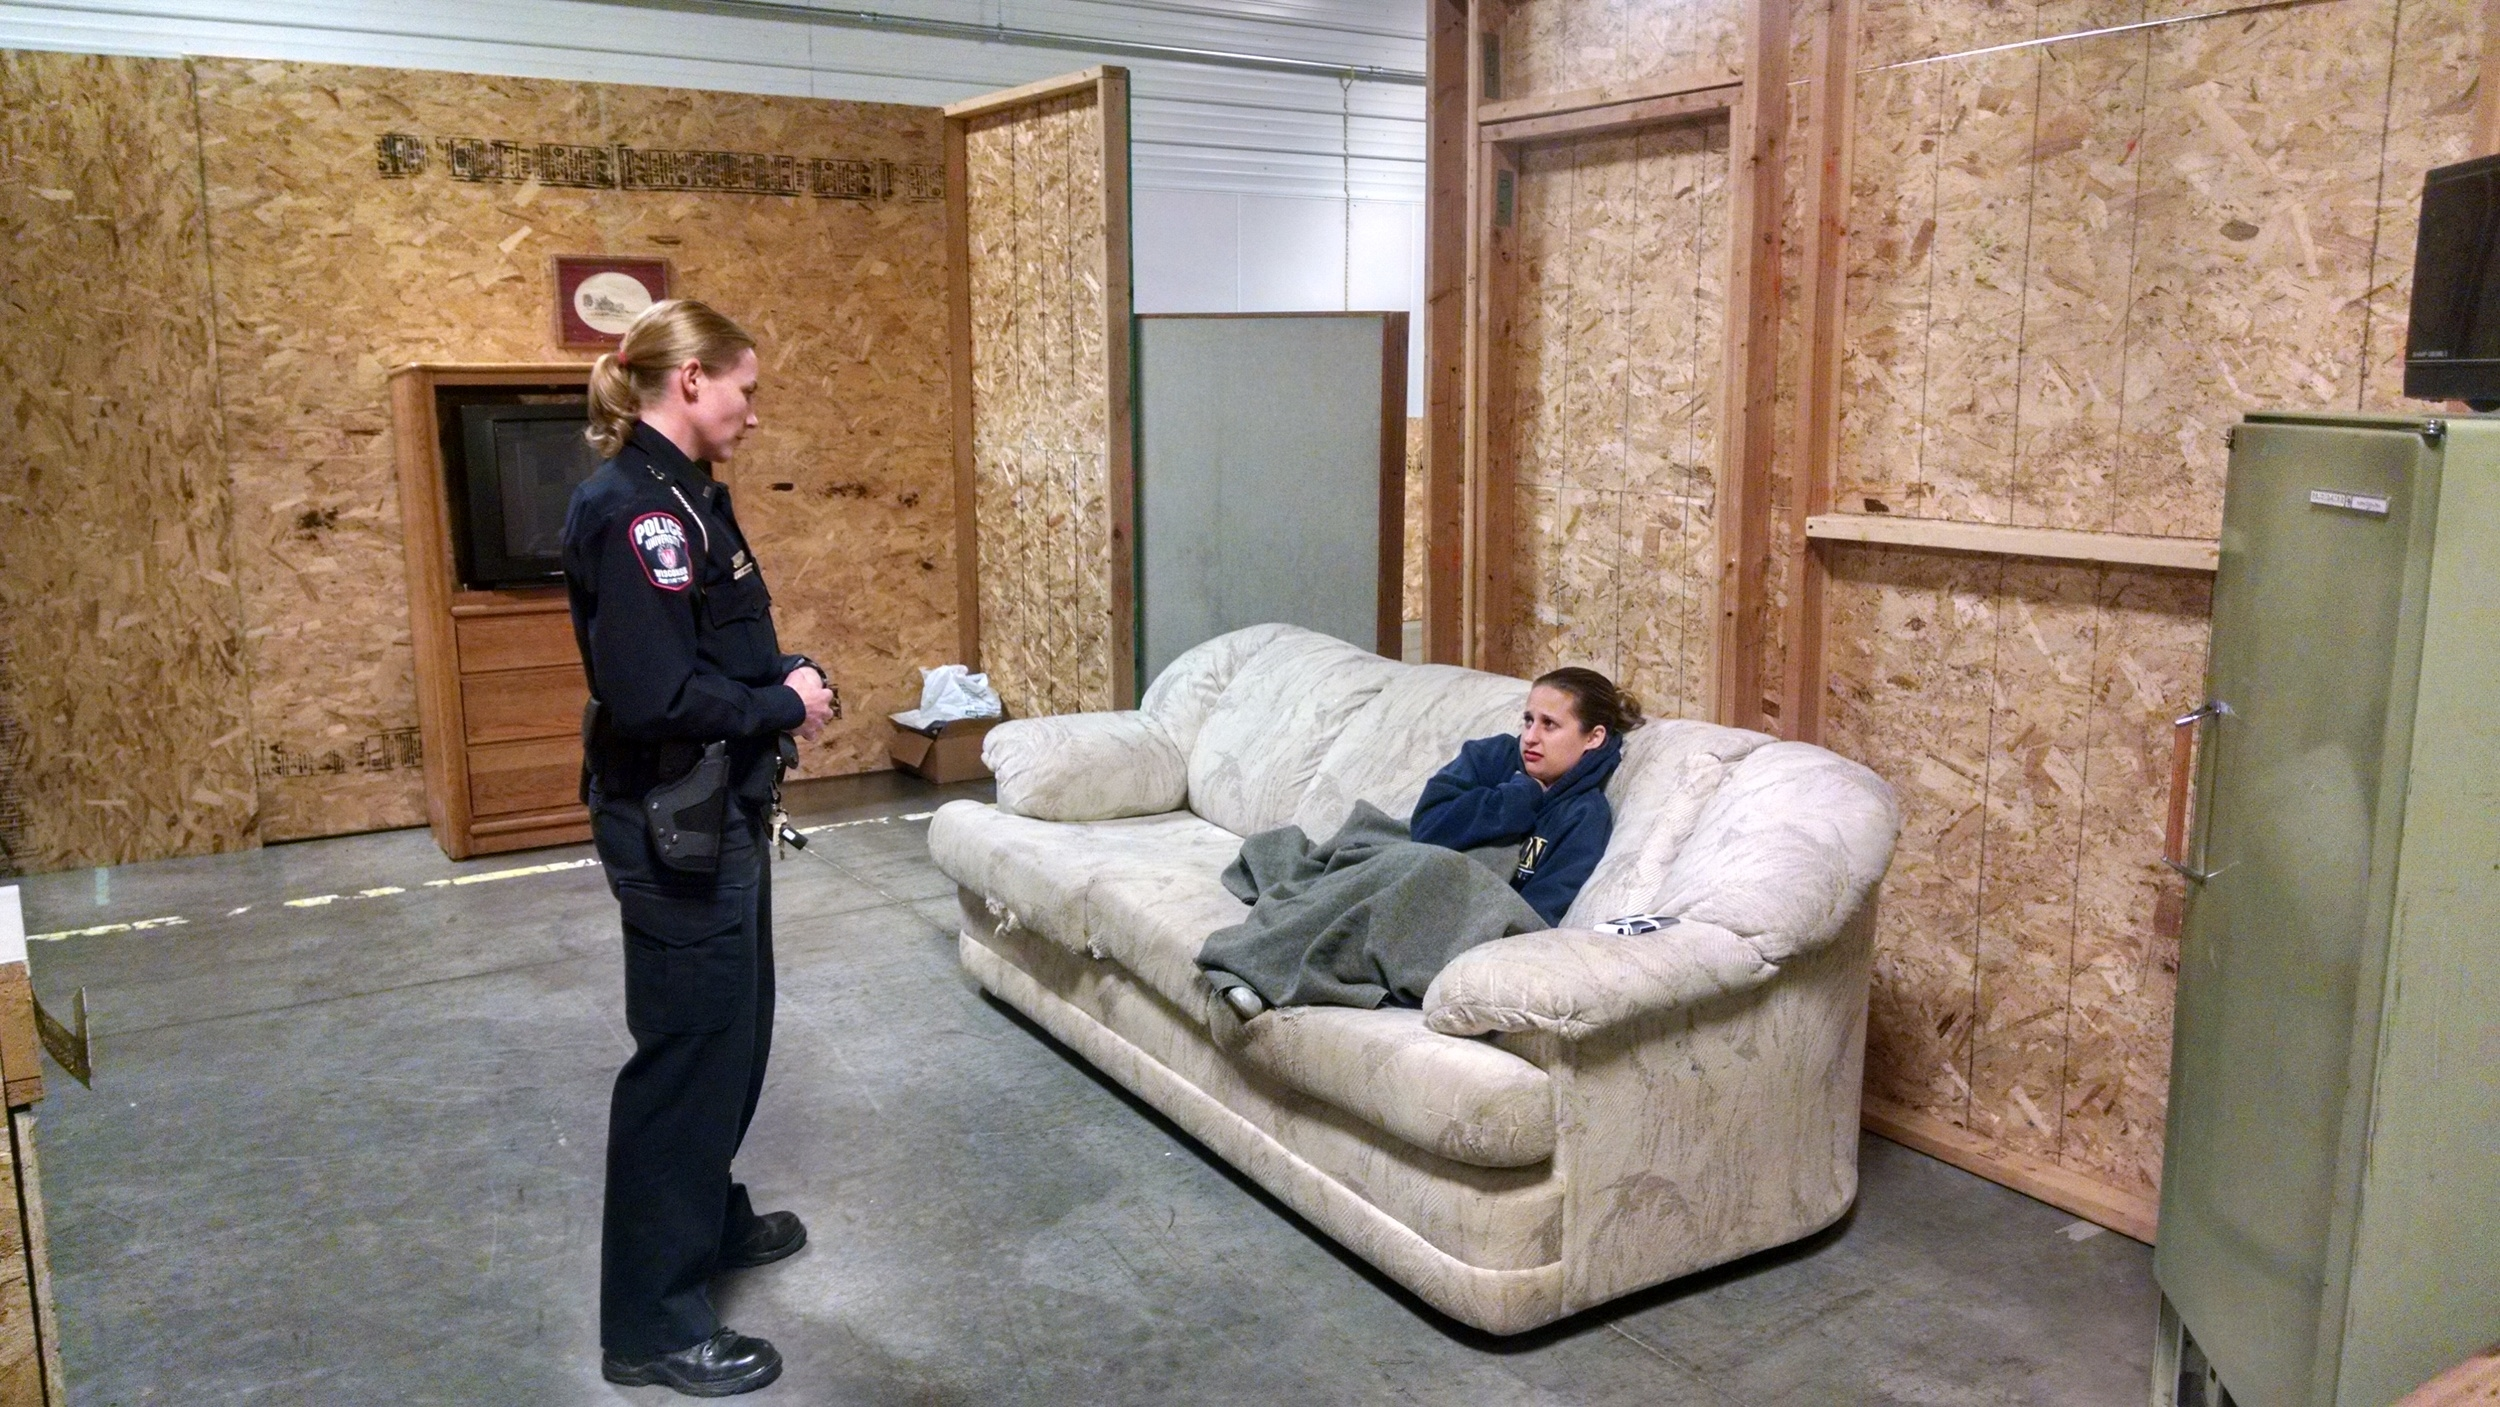 Madison Police Department and NAMI Dane CIT: Role Play de-esclation Scenarios, Dec. 2015